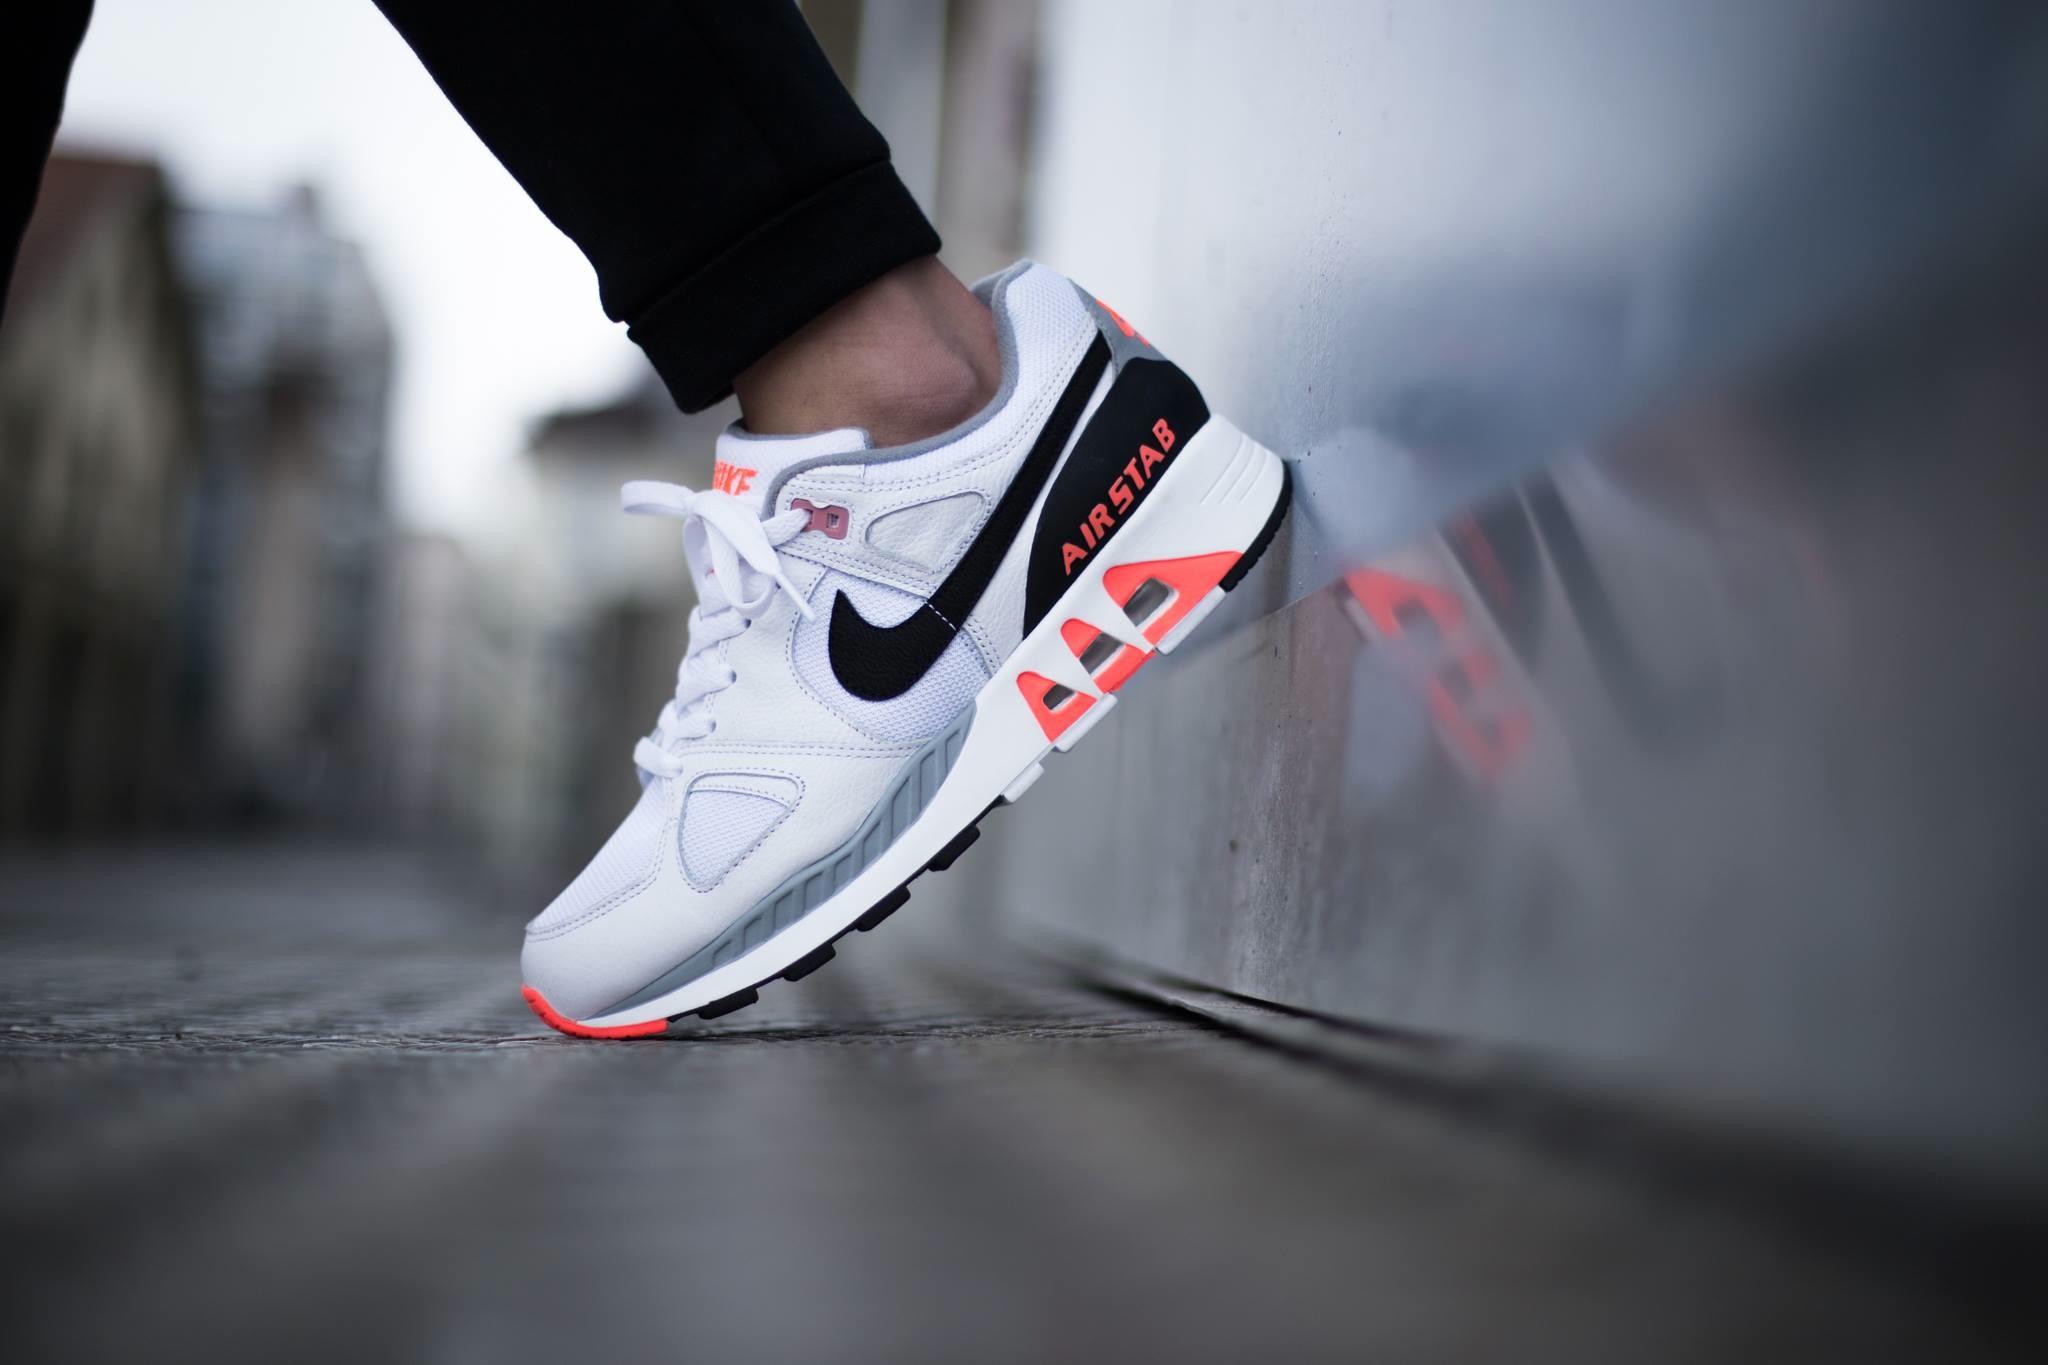 Nike-Air-Stab-Infrared-3